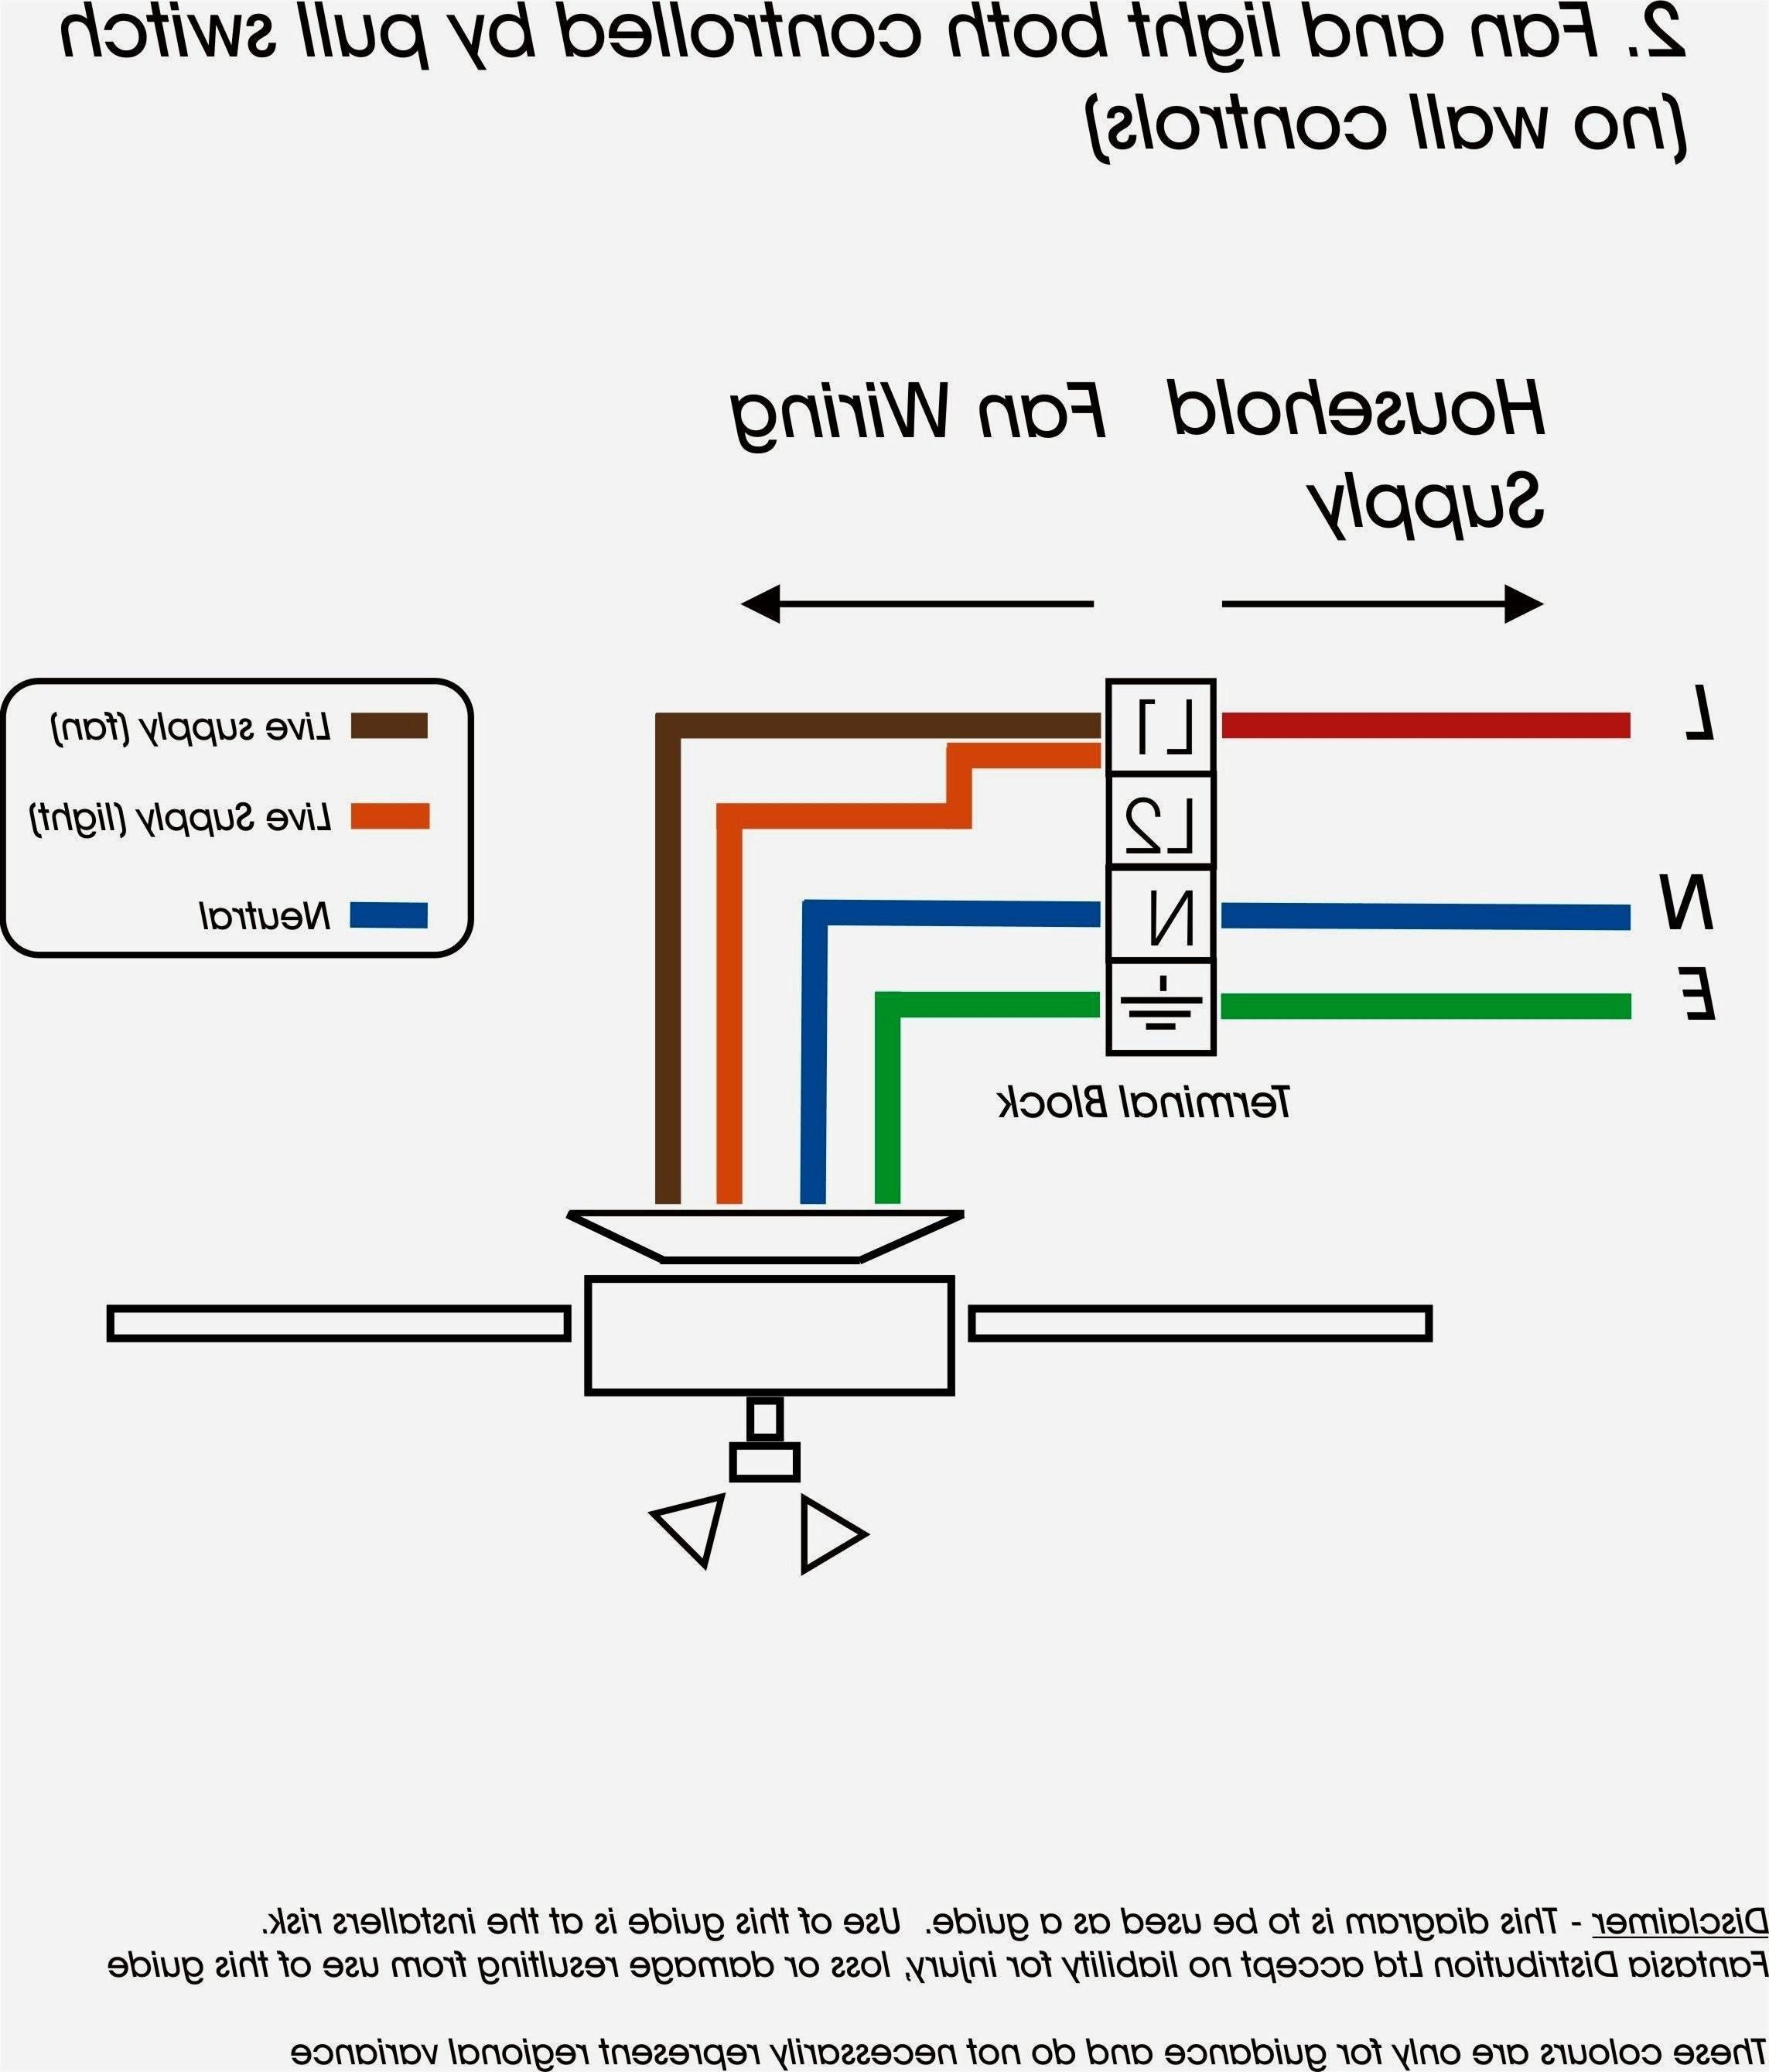 Car Air Horn Wiring Diagram 1cafbb Wiring Diagram for Self Switching Relay 12s socket Of Car Air Horn Wiring Diagram